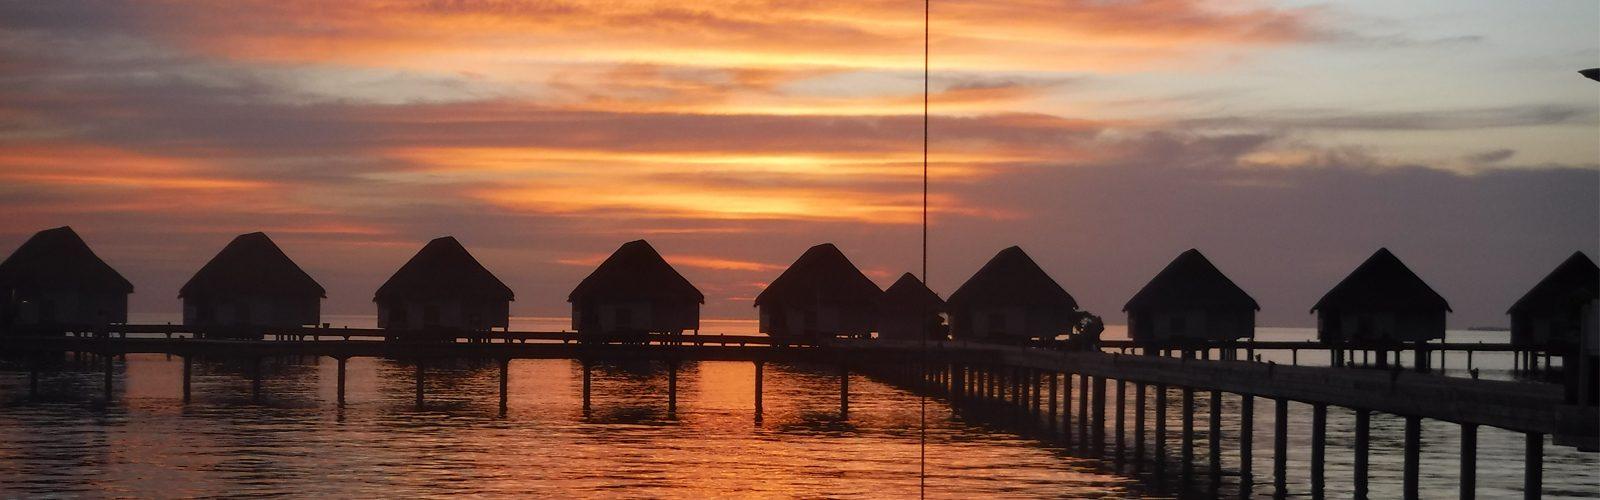 Maldives Honeymoon Luxury Maldives Honeymoon Packages Header